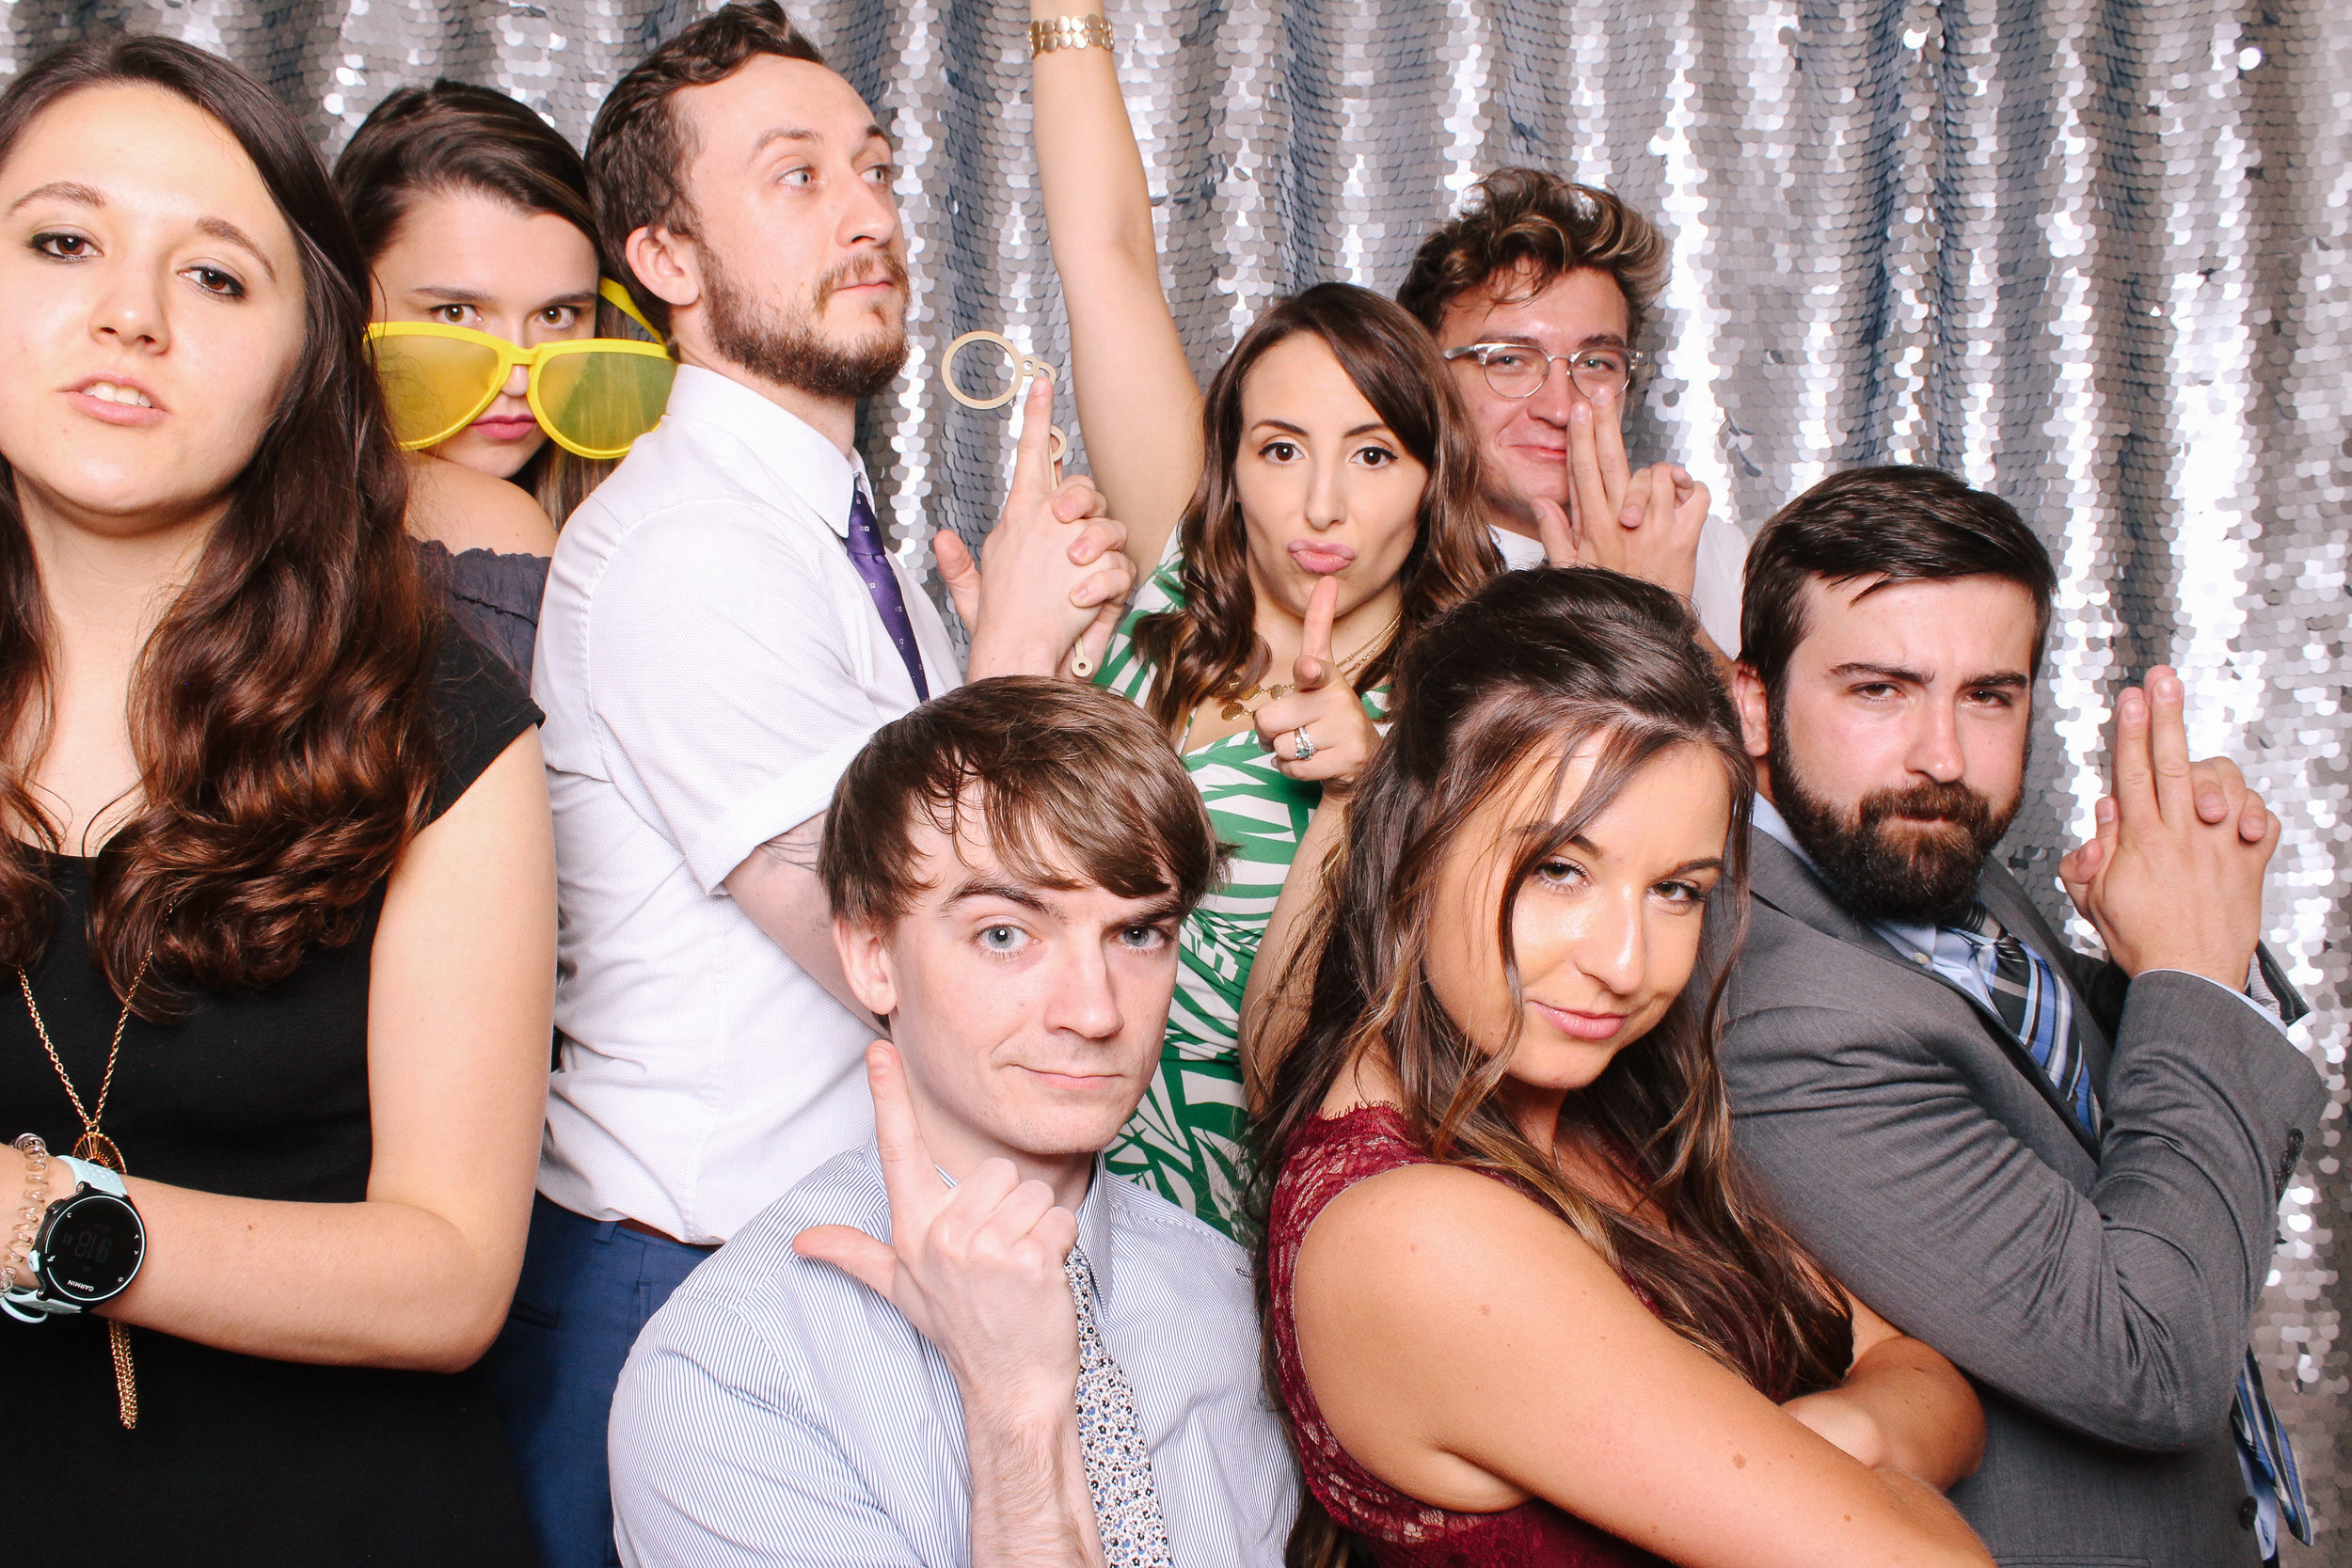 0182 Cleveland Wedding Photobooth too much awesomeness.jpg